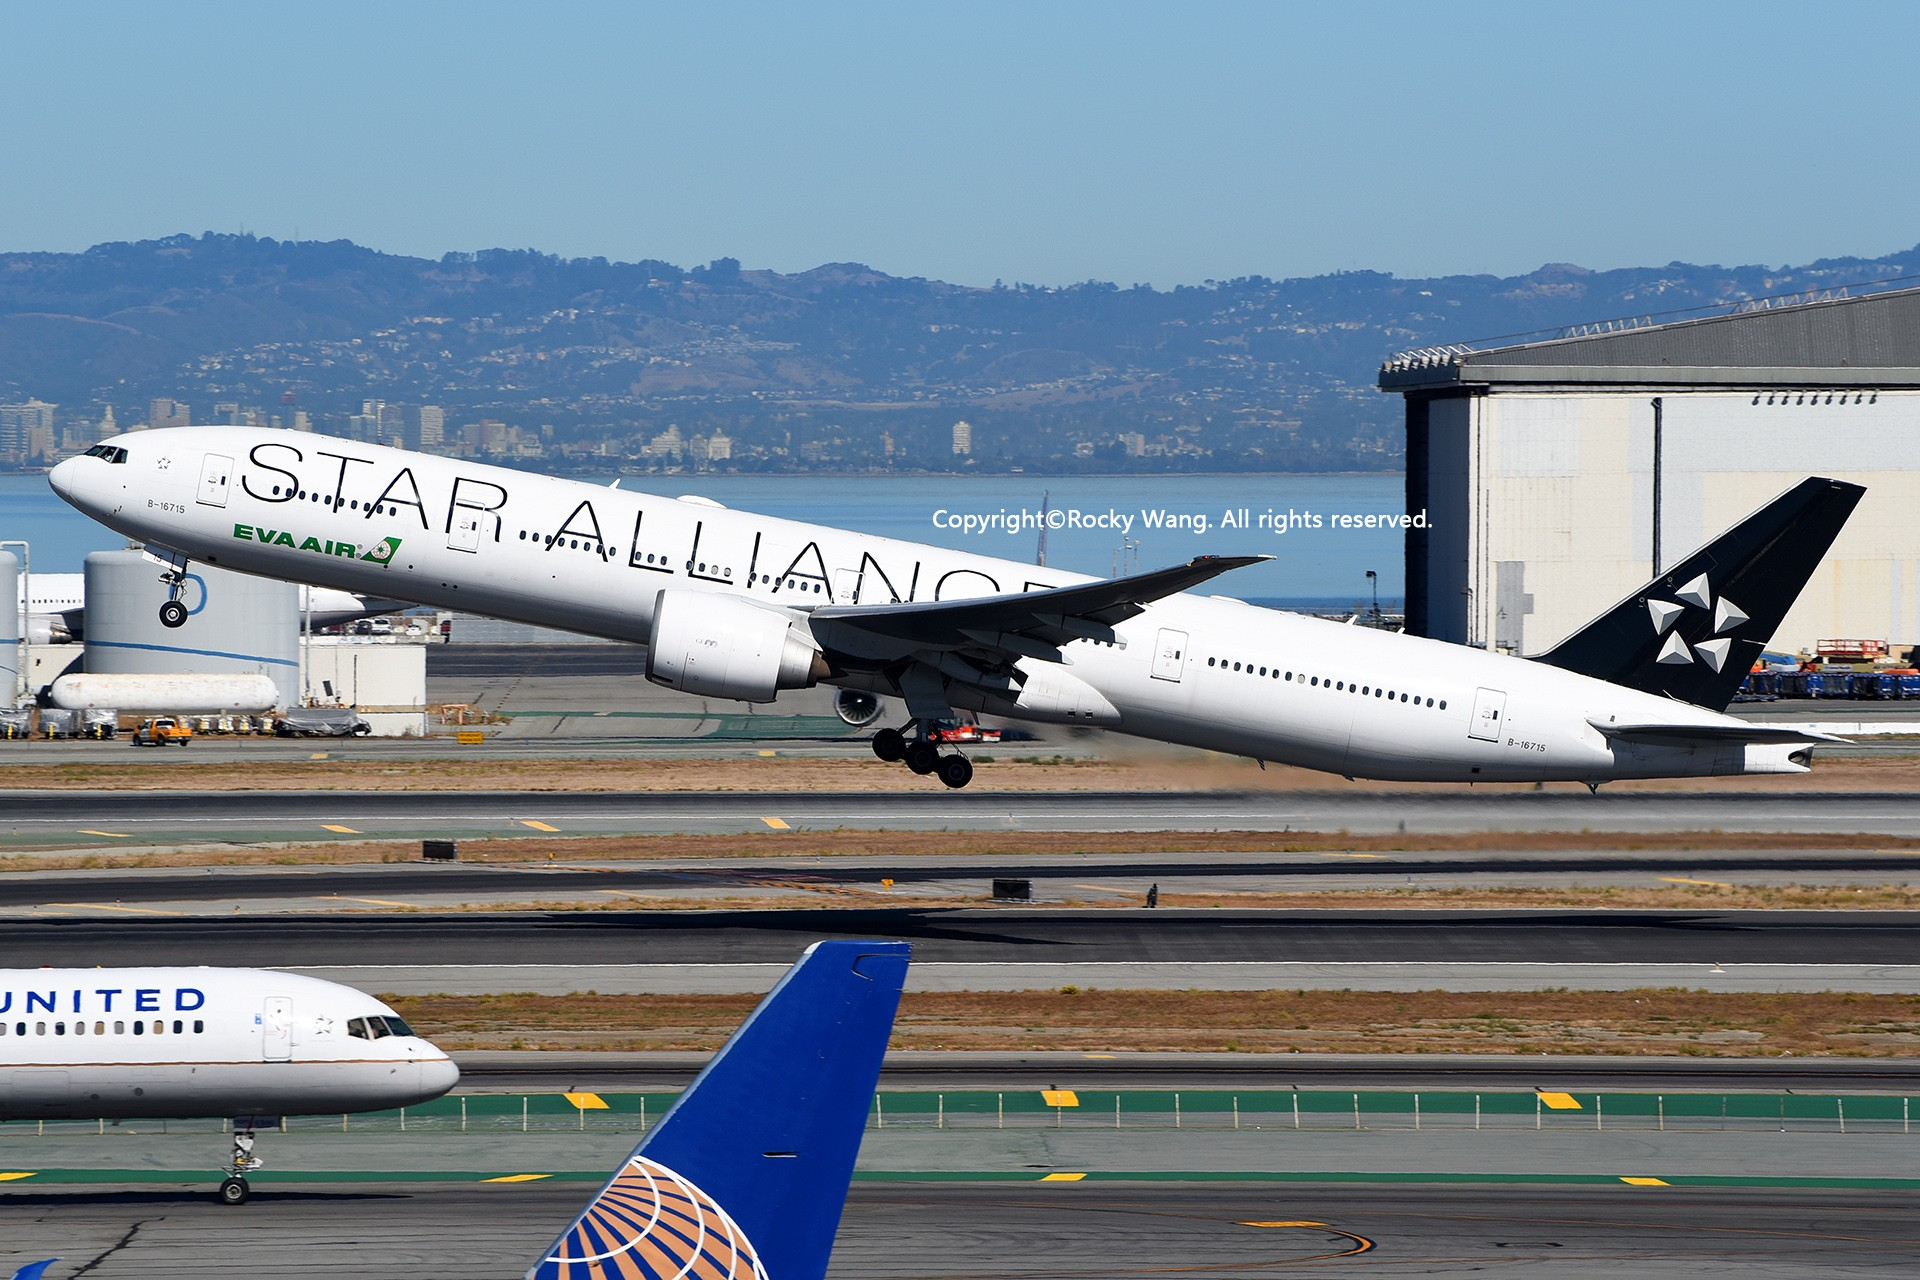 Re:[原创]彩绘圣地-附加彩蛋 BOEING 777-35EER B-16715 San Francisco Int'l Airport